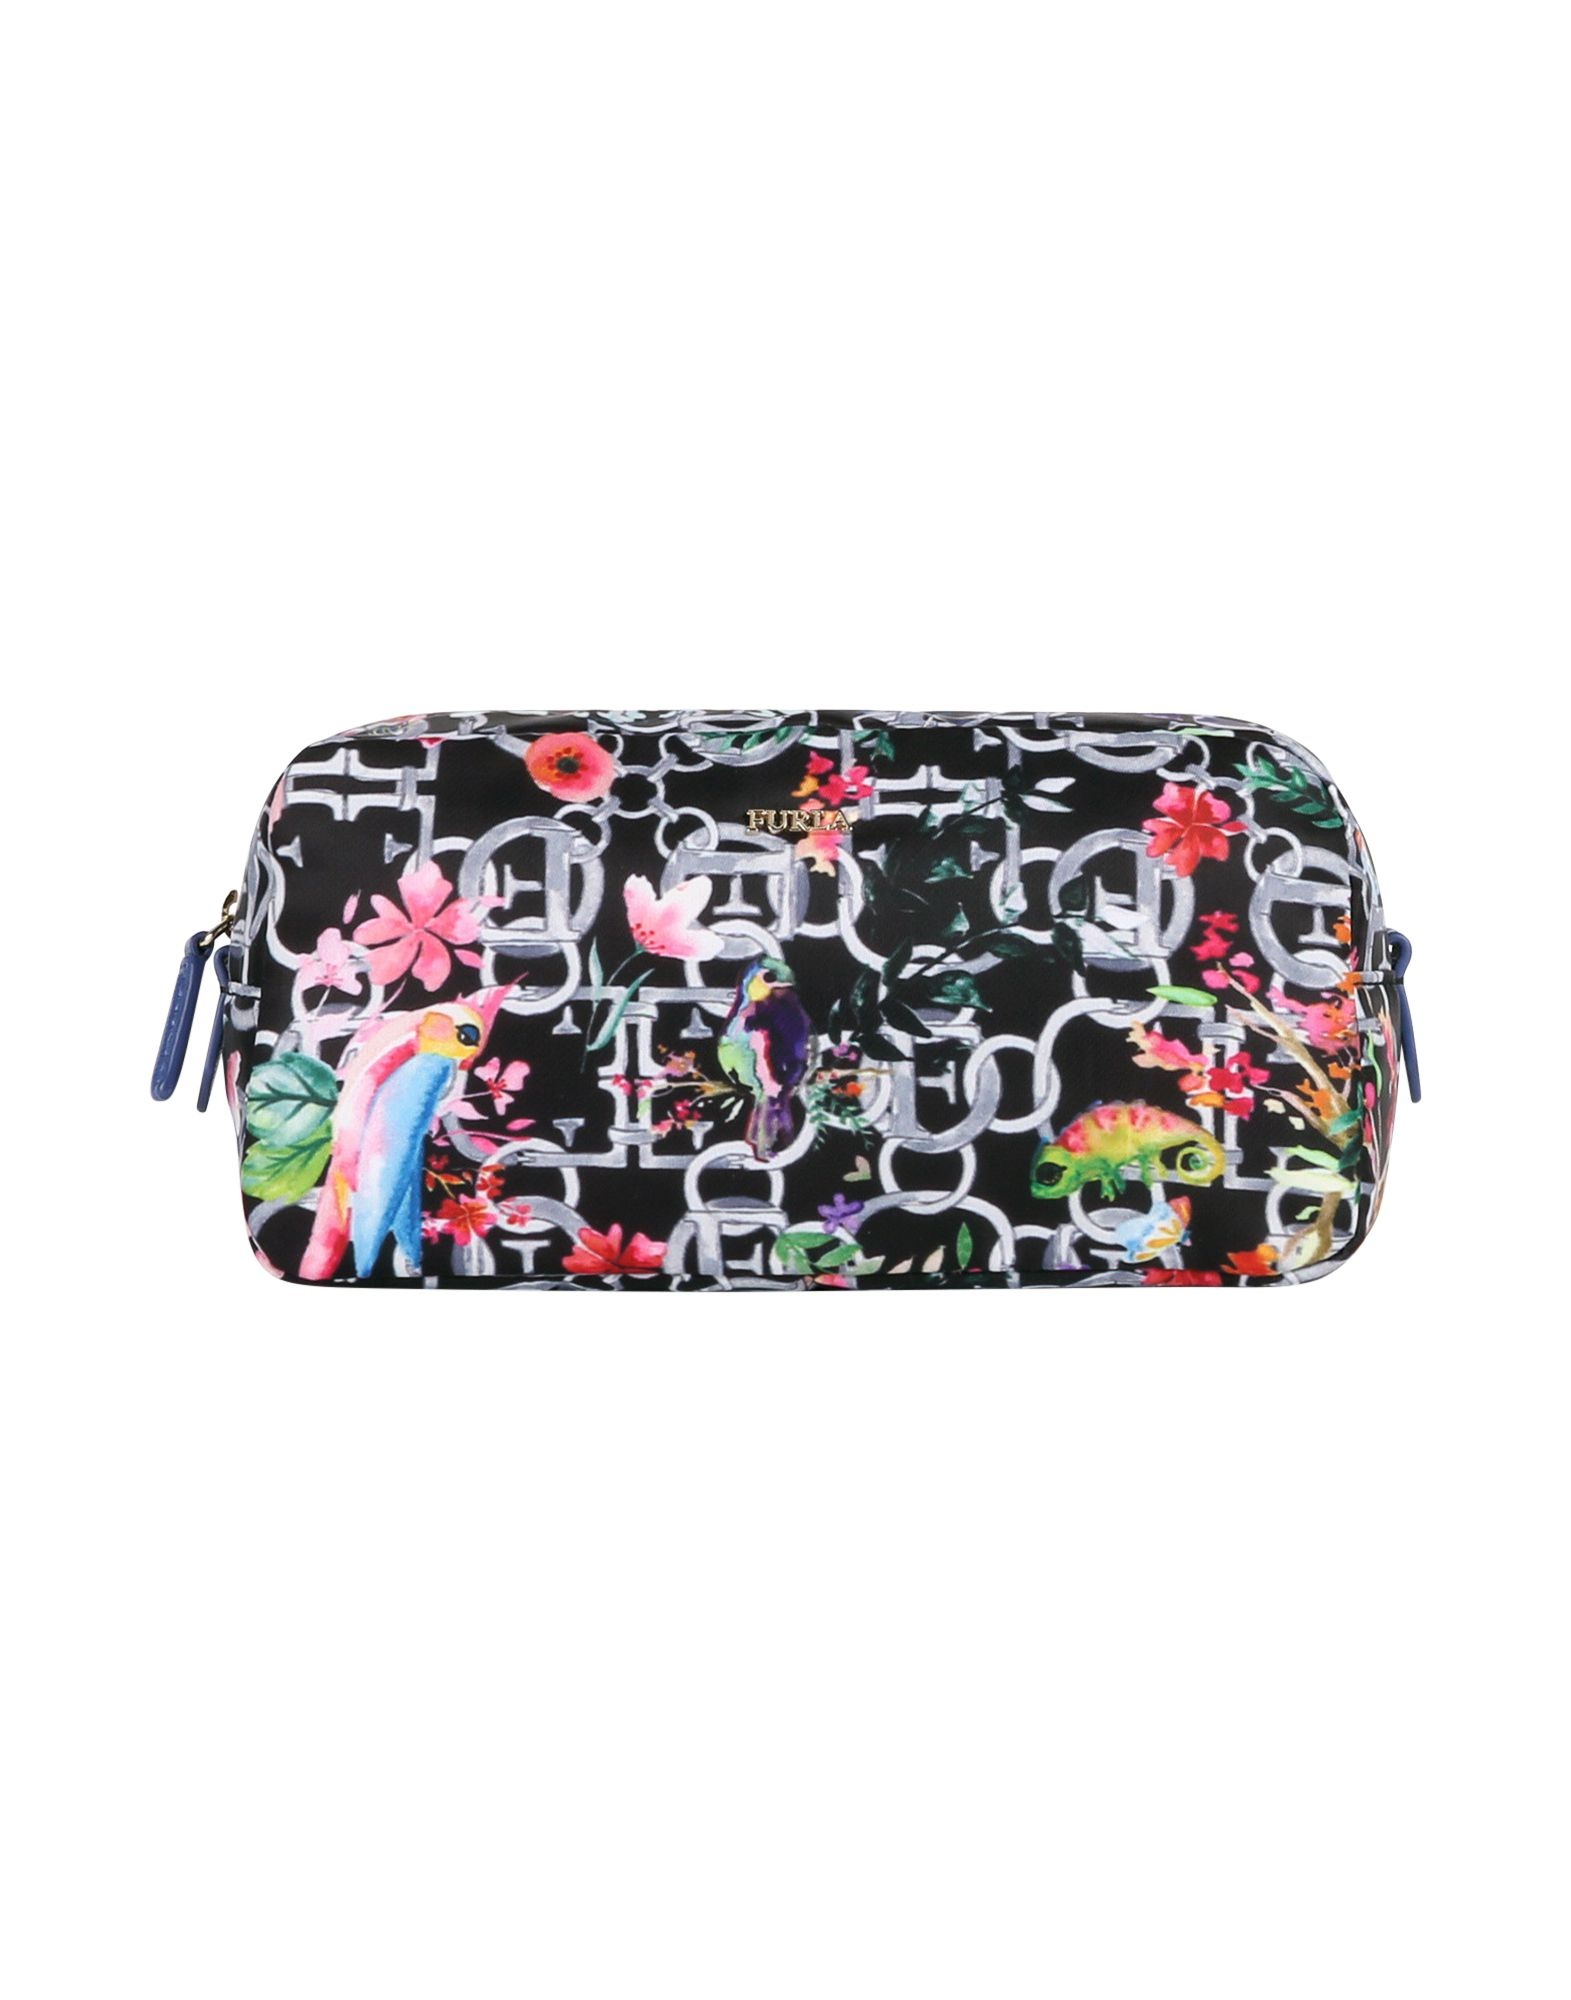 Фото - FURLA Beauty case women cosmetic bag travel lattice pattern makeup case zipper make up bags organizer storage pouch toiletry kit wash beauty bags